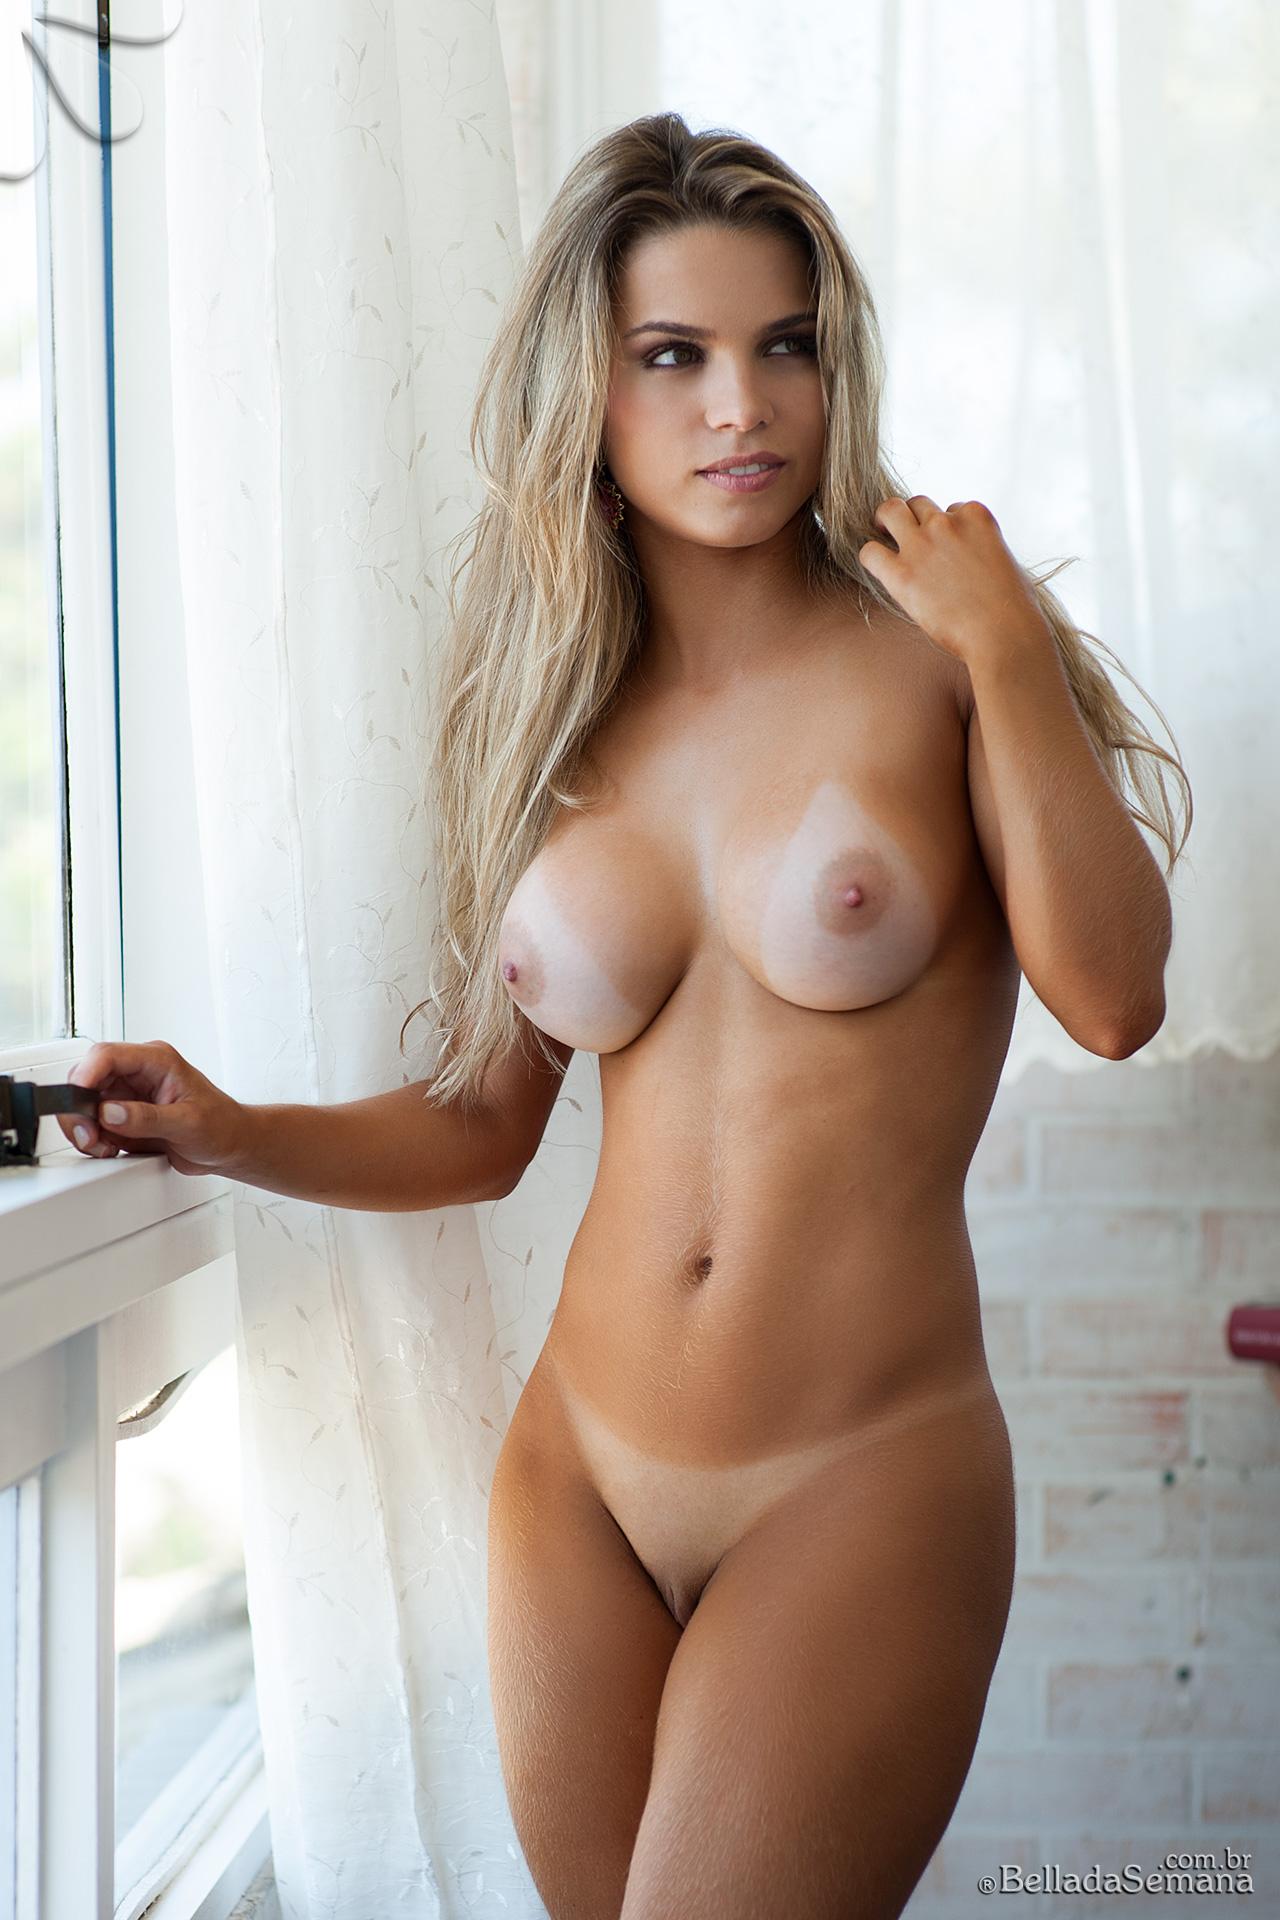 Amanda Bynes Naked Pics amanda sagaz porn pic - eporner